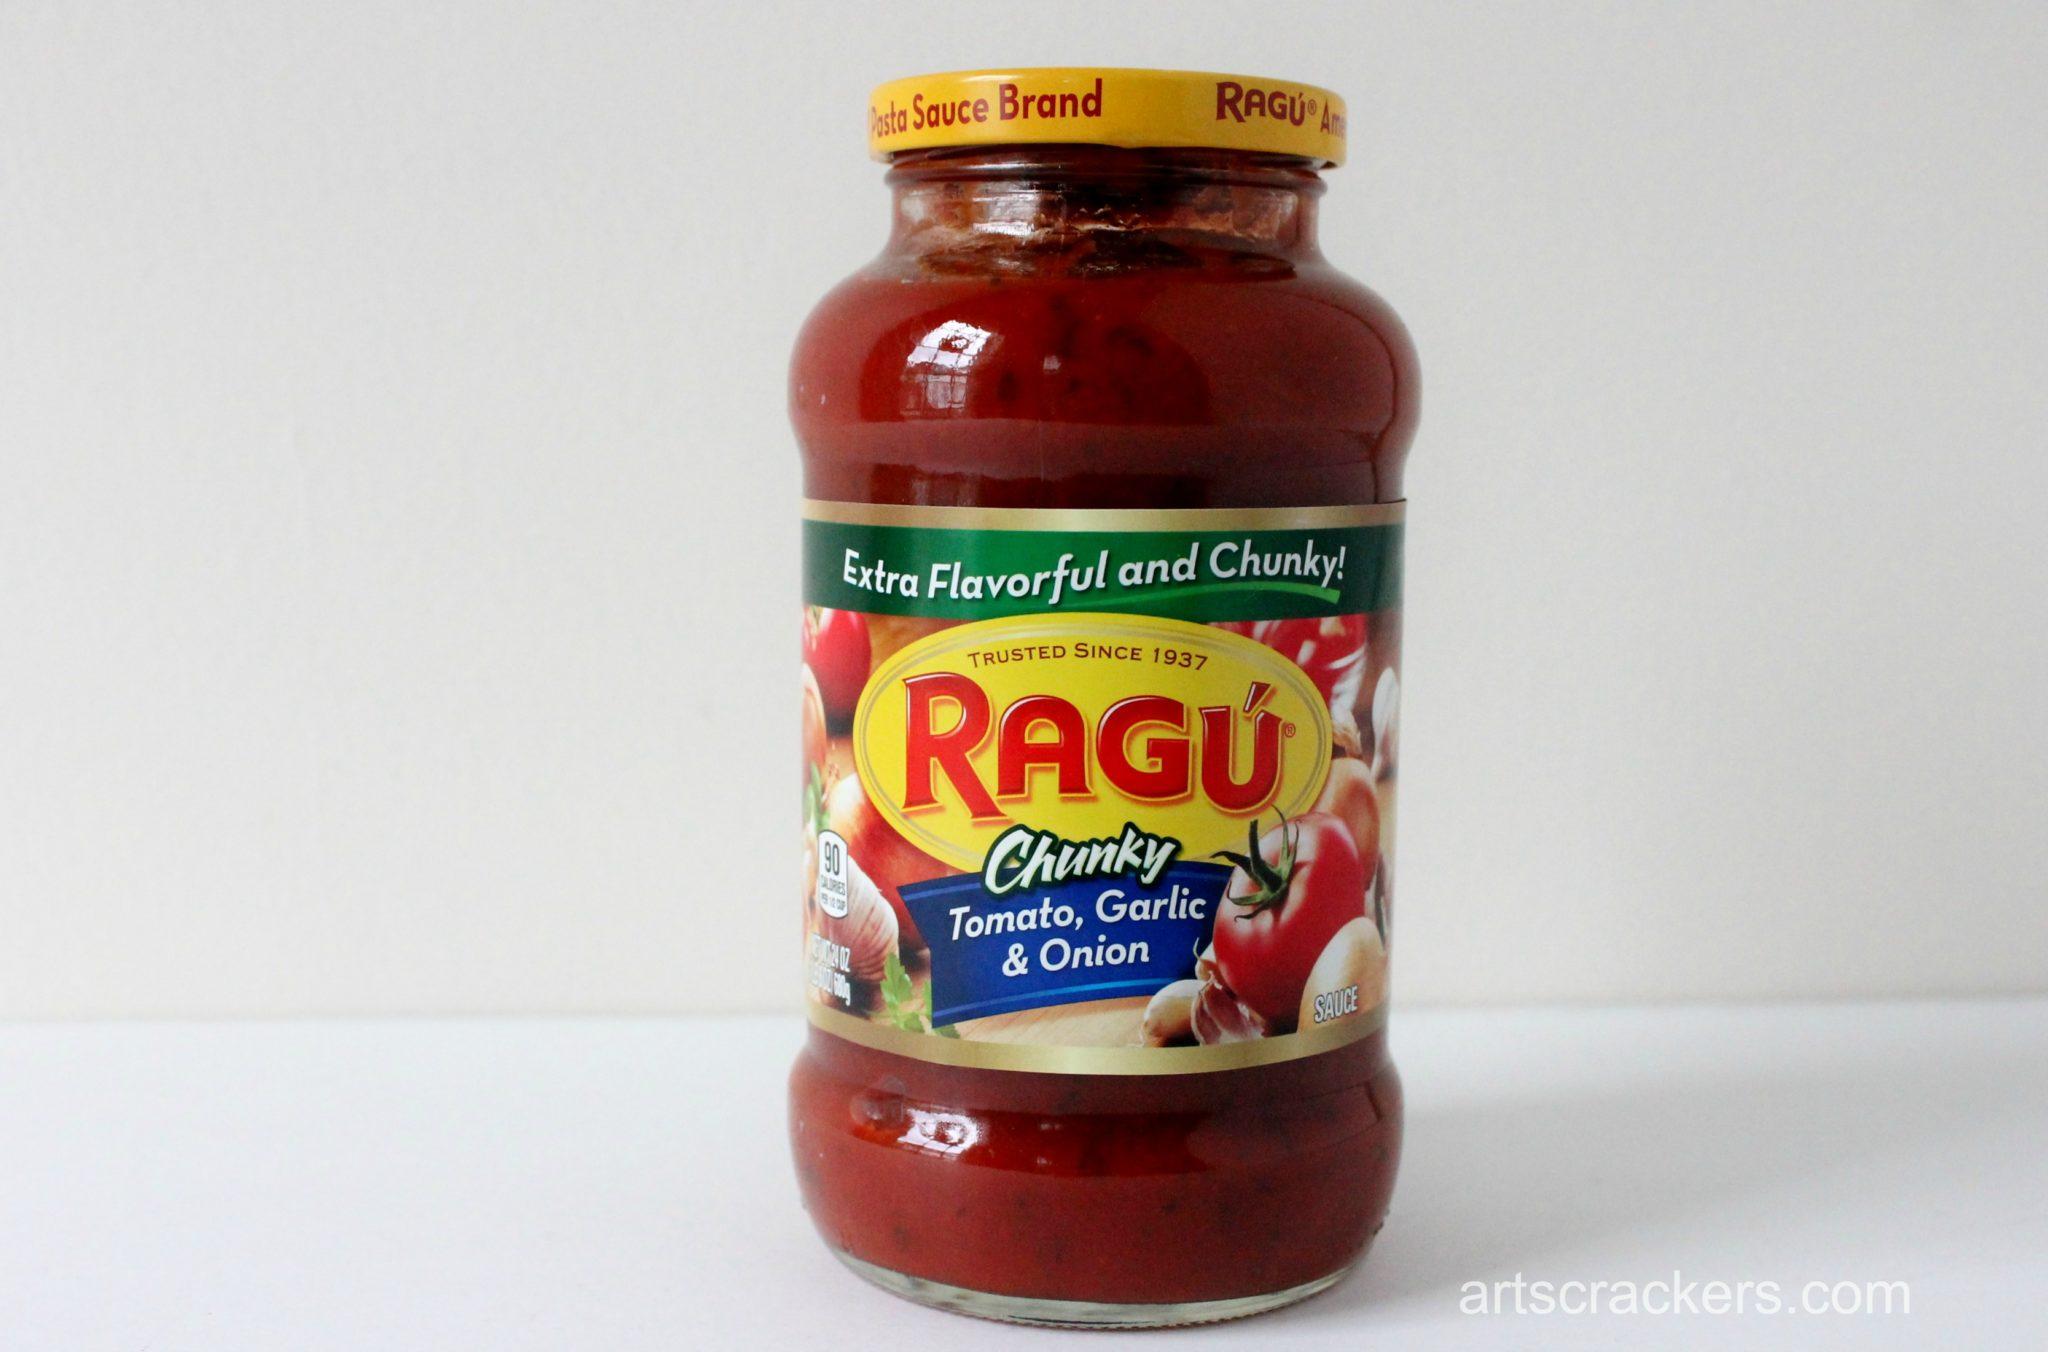 Ragu Pasta Sauce Tomato Garlic Onion